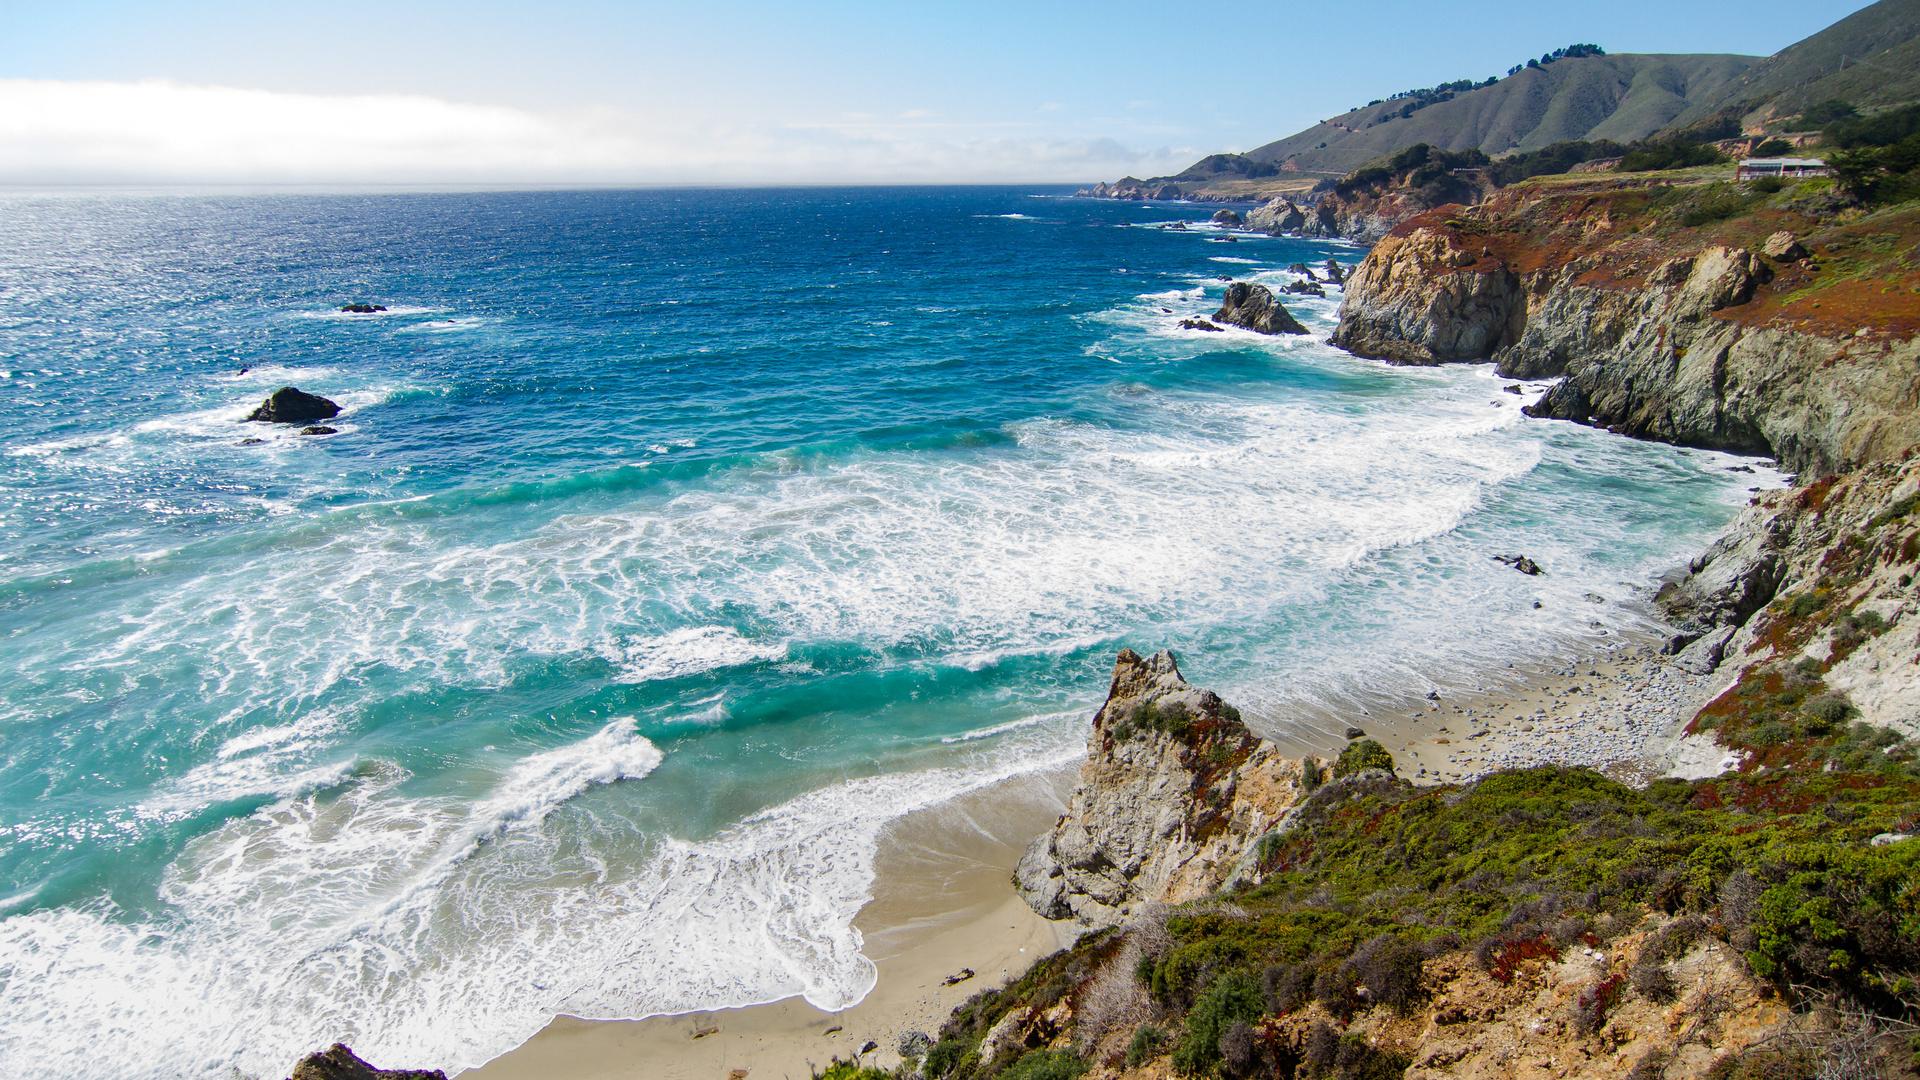 побережье, океан, калифорния, природа